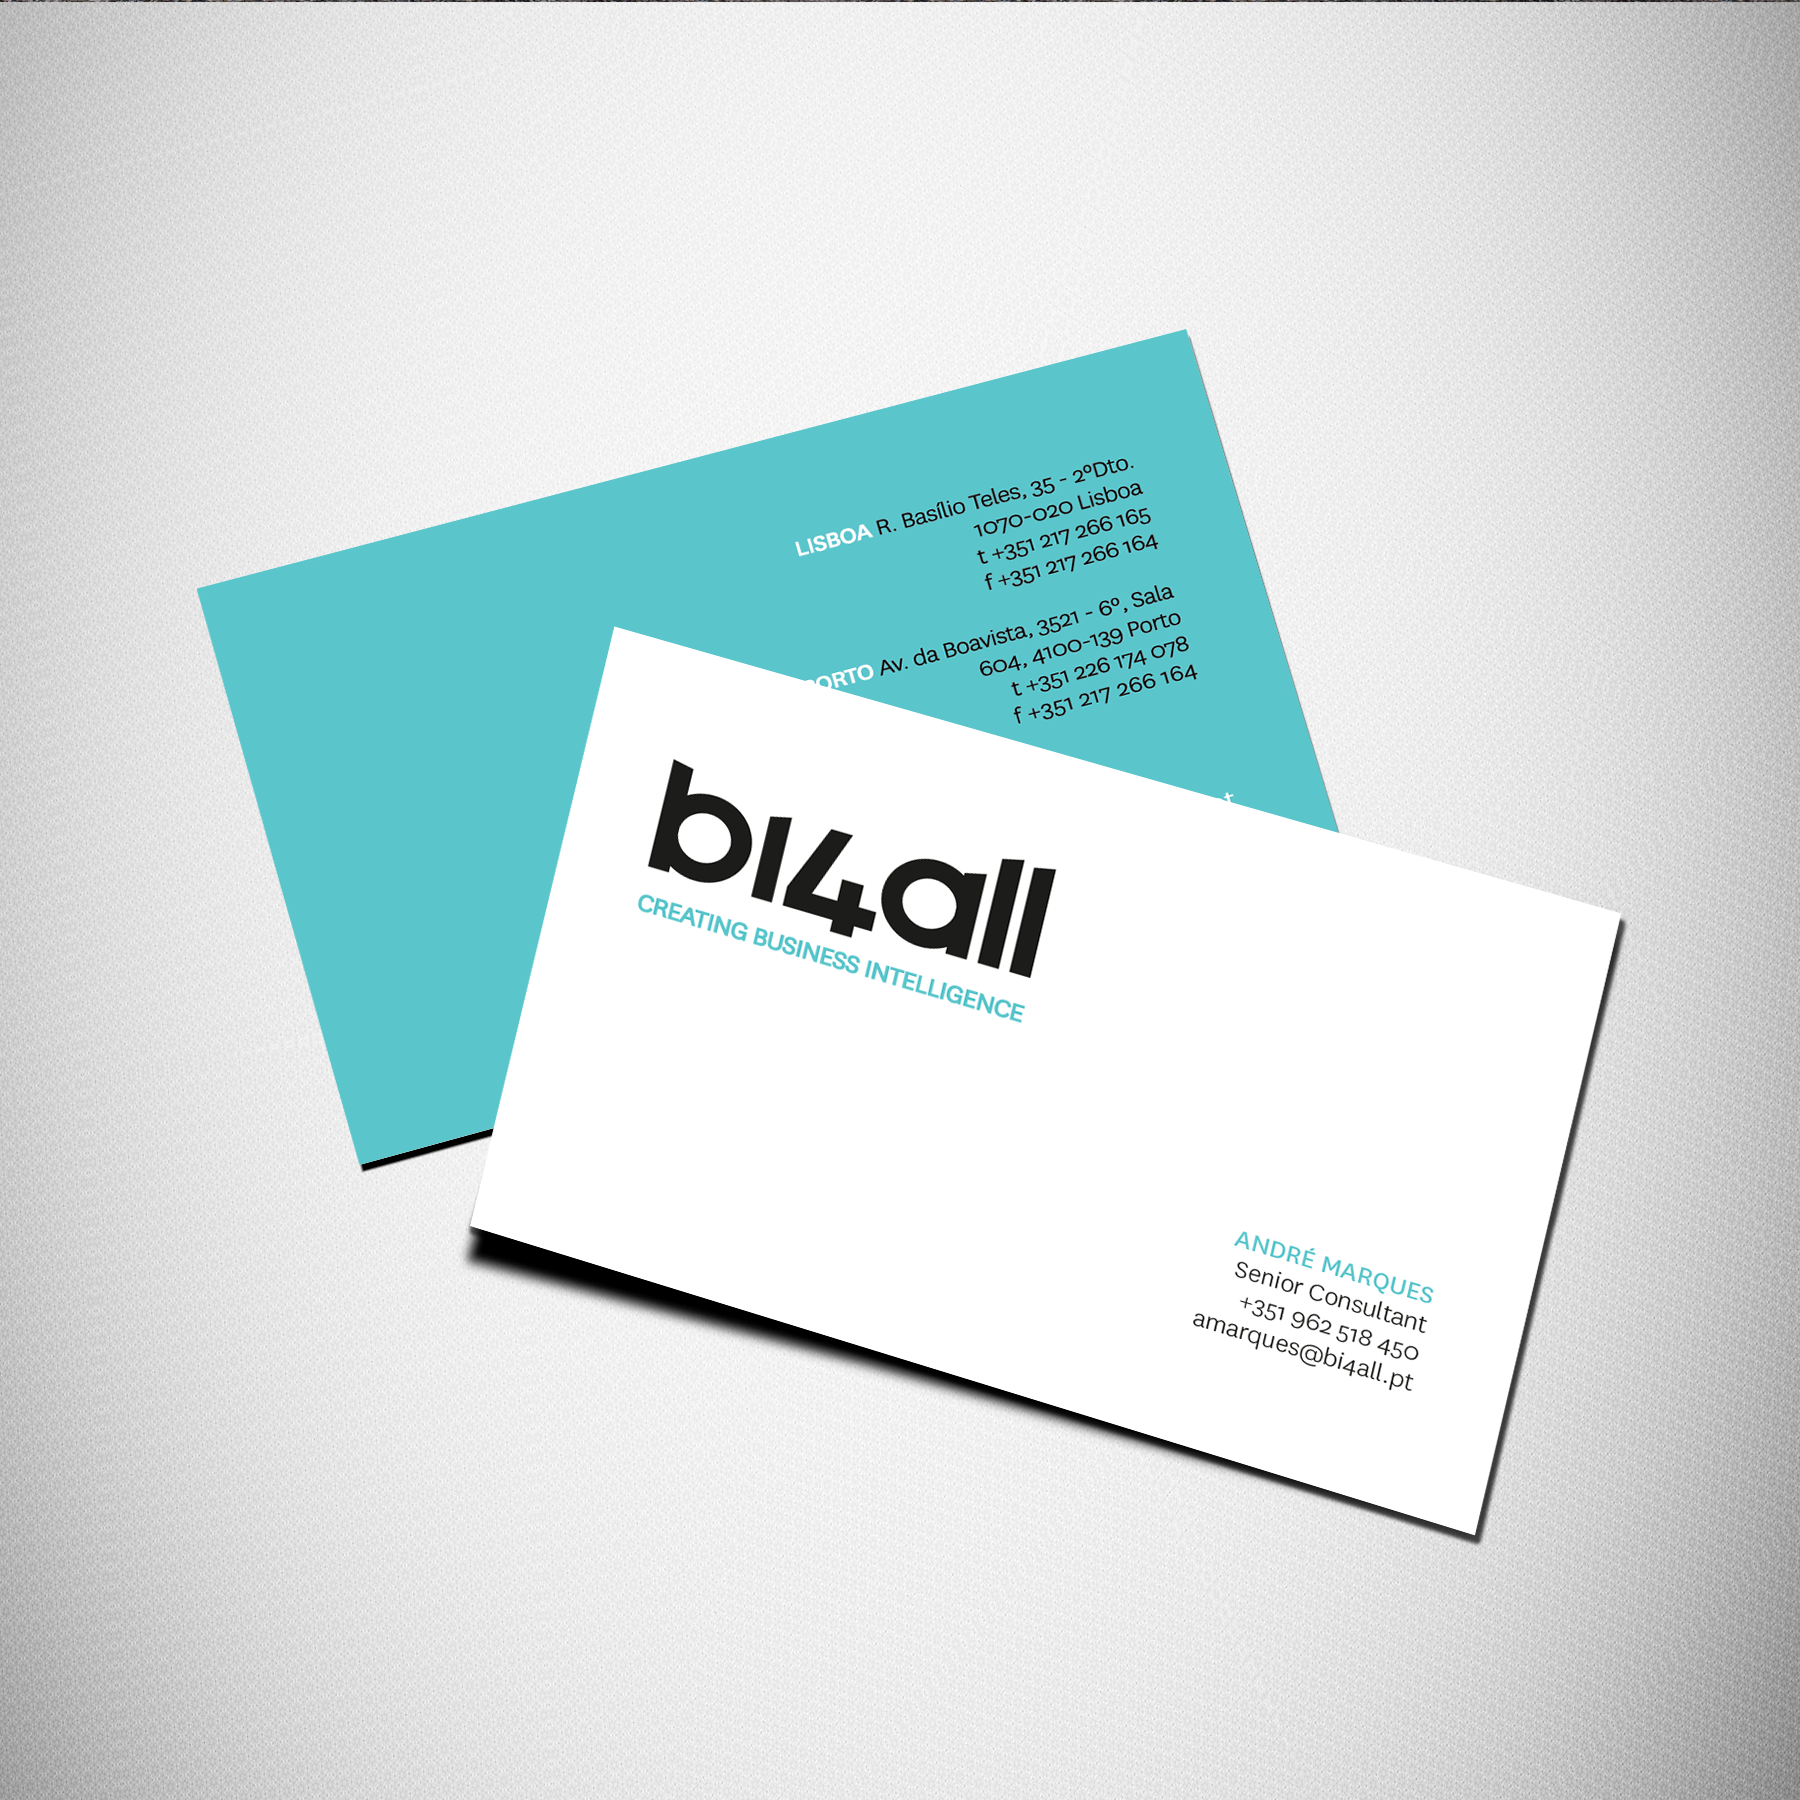 Business Card for BI4ALL #card #design #stationery | Sonia Silva\'s ...